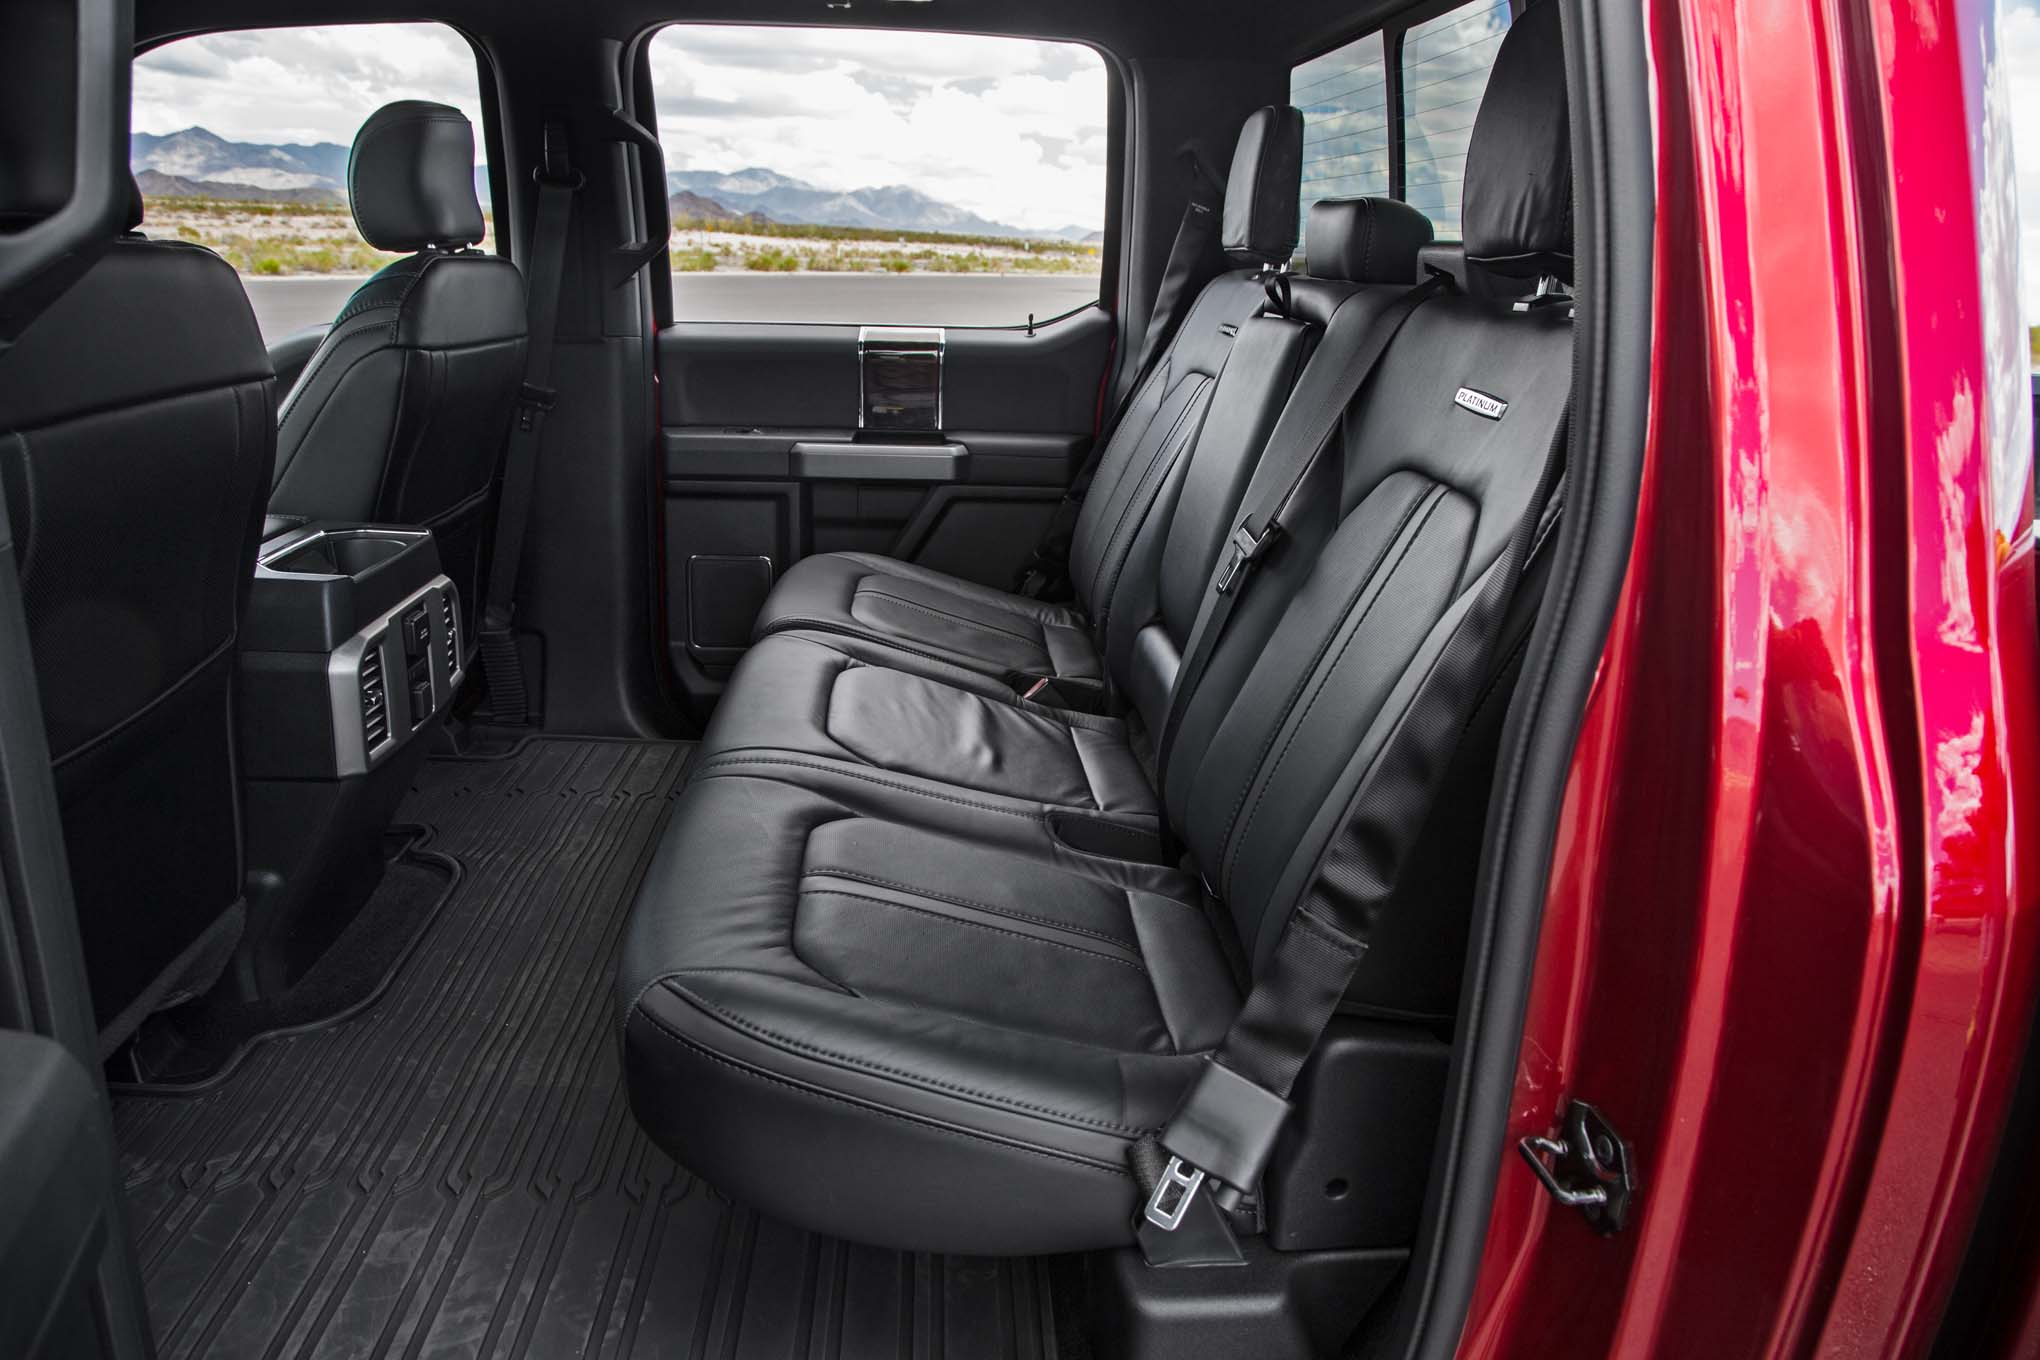 2016 Gmc Sierra Crew Cab Rear Seat Storage